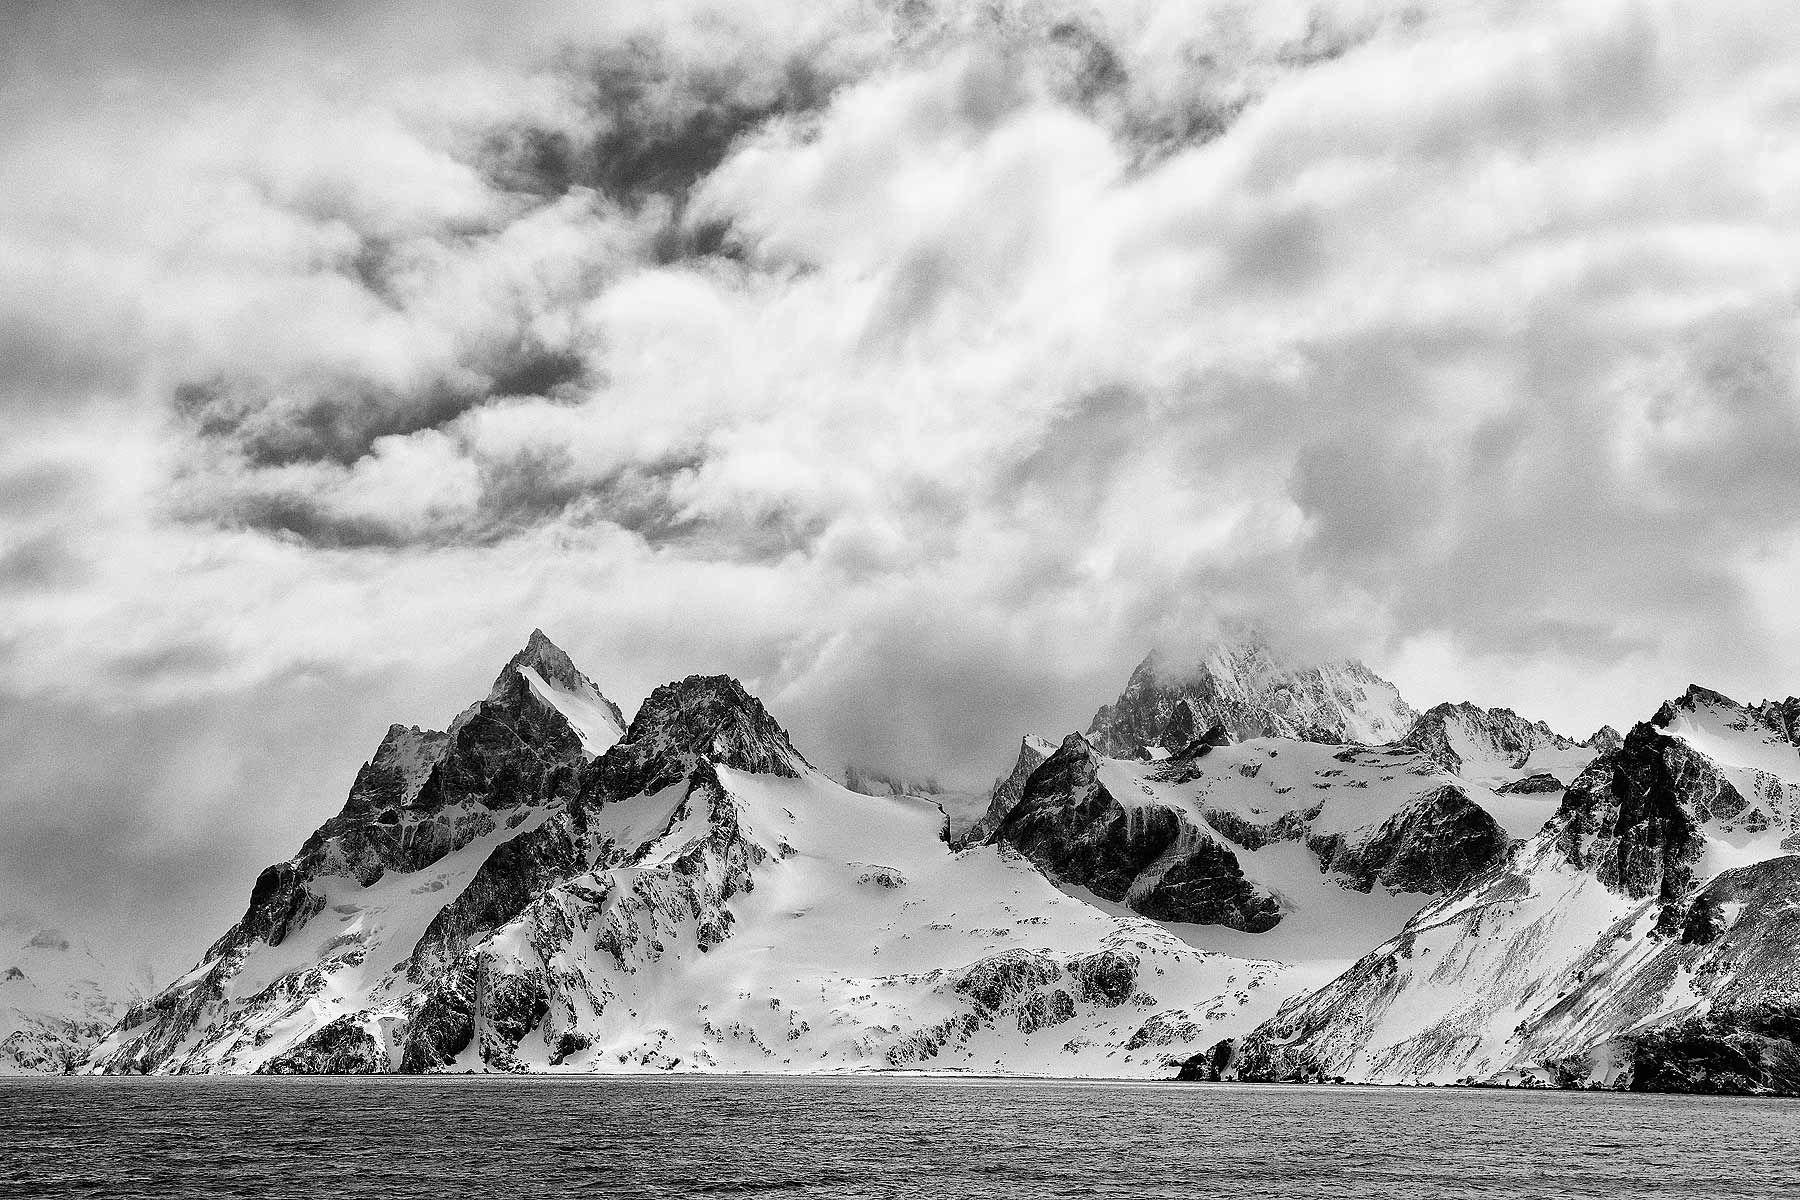 Entrance-to-Drygalski-Fjord_B&W_S6A1413-Drygalski-Fjord,-Cooper-Sound,-South-Georgia-Islands,-Southern-ocean.jpg